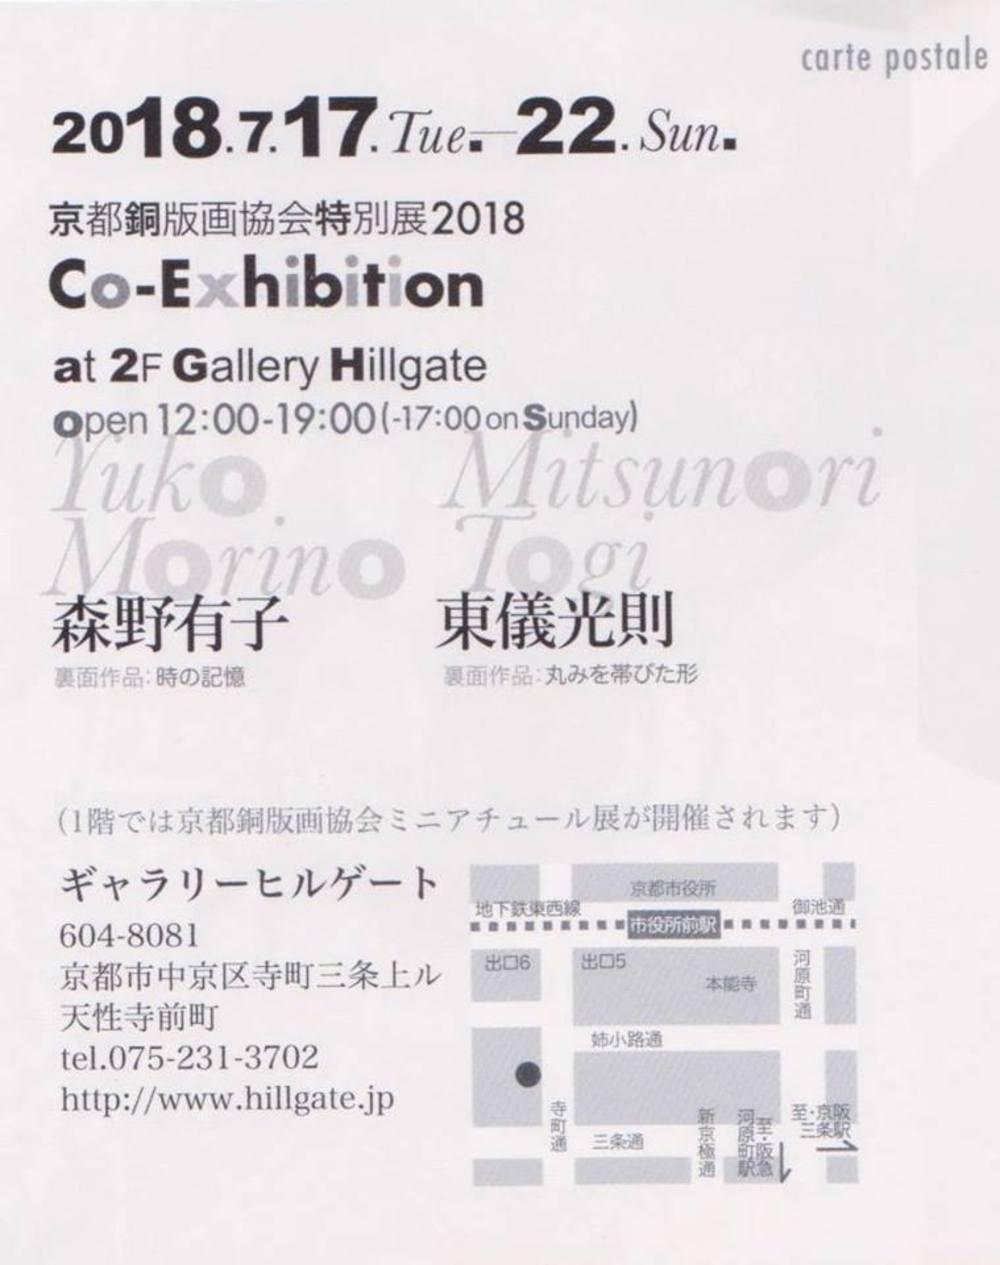 京都銅版画協会特別展示 森野有子 東儀光則 展のお知らせ1